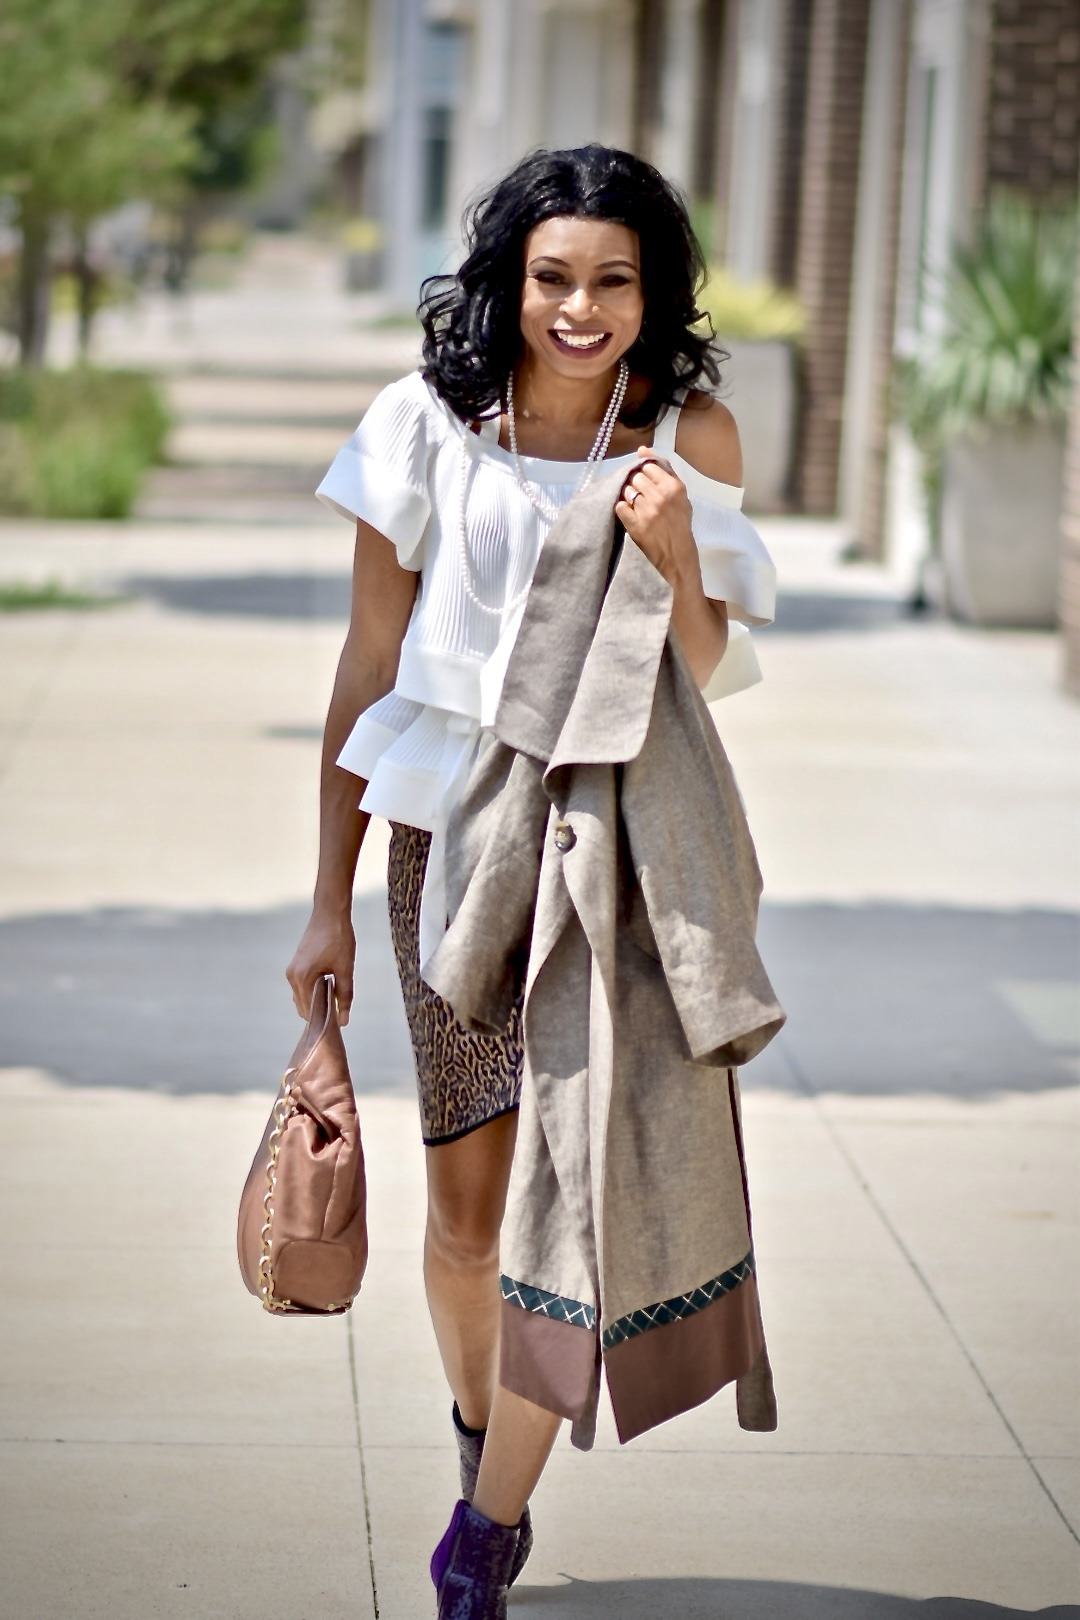 Tiered ruffle top + animal print bandage skirt